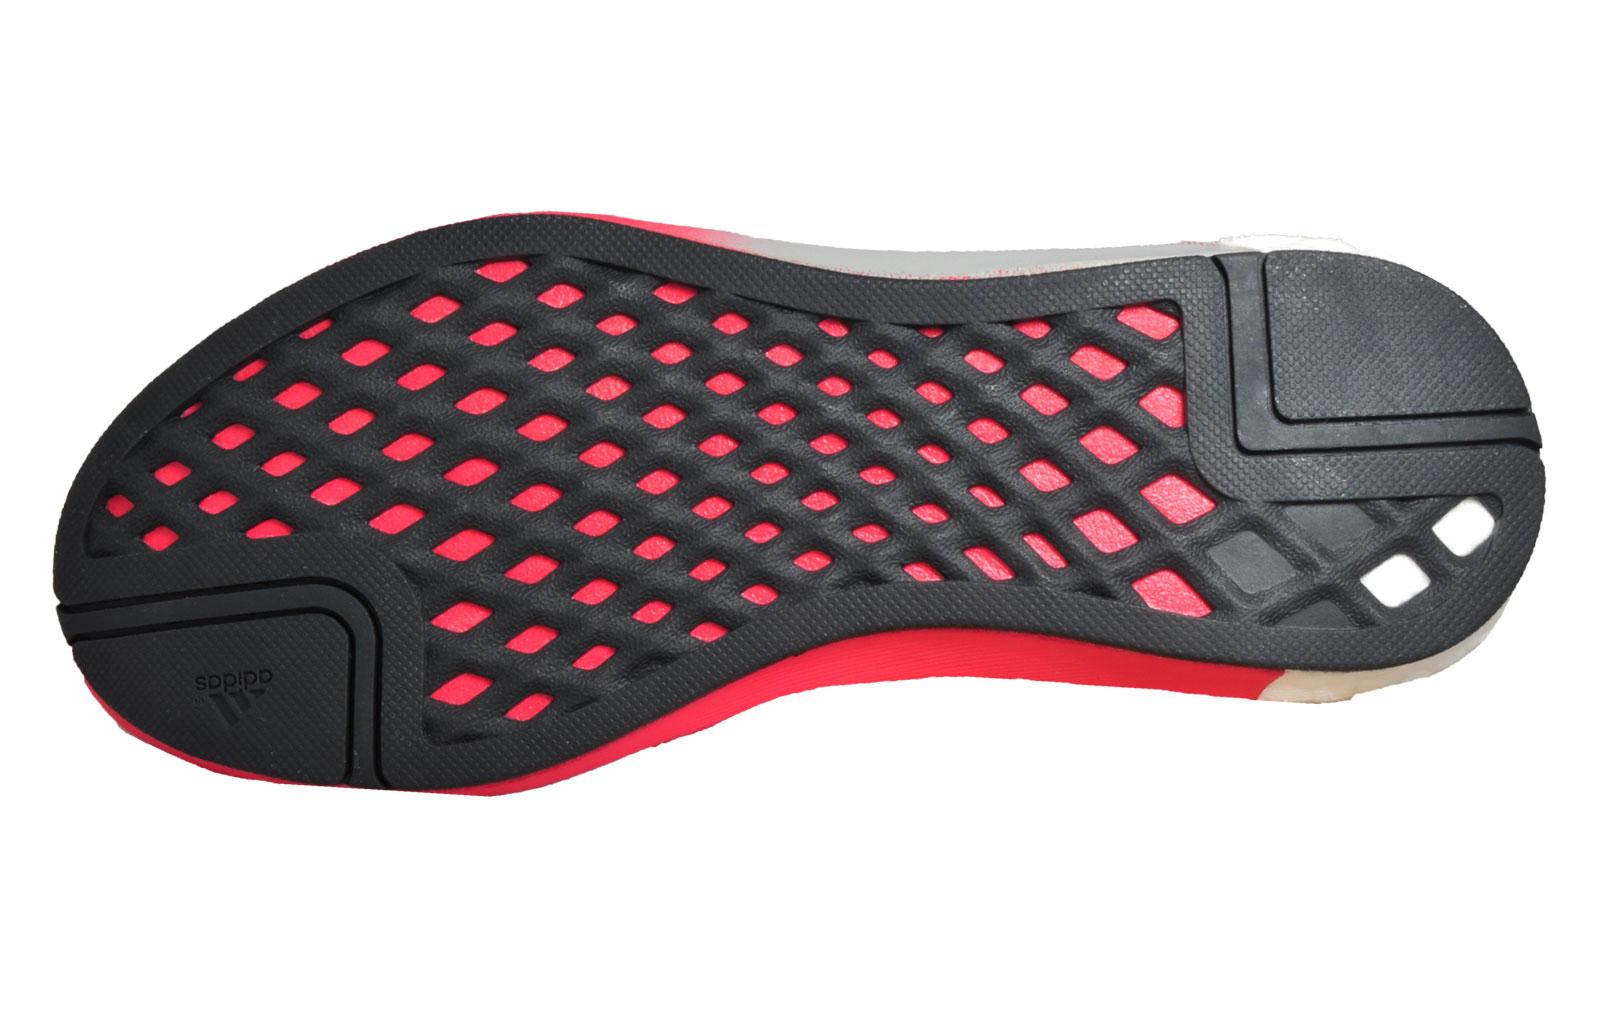 baa906a860 Adidas Solar RNR Boost Womens Premium Running Fitness Gym Trainers Pink